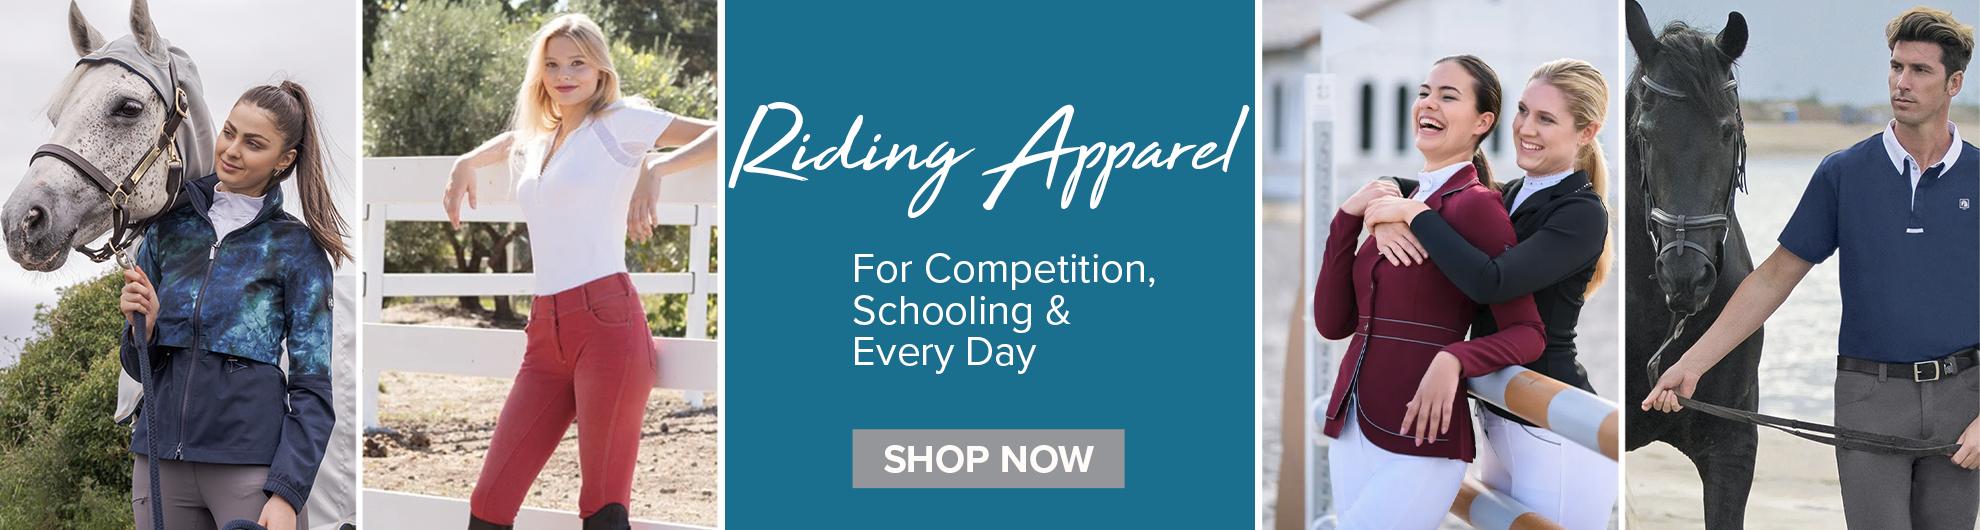 Riding apparel on Equishipper